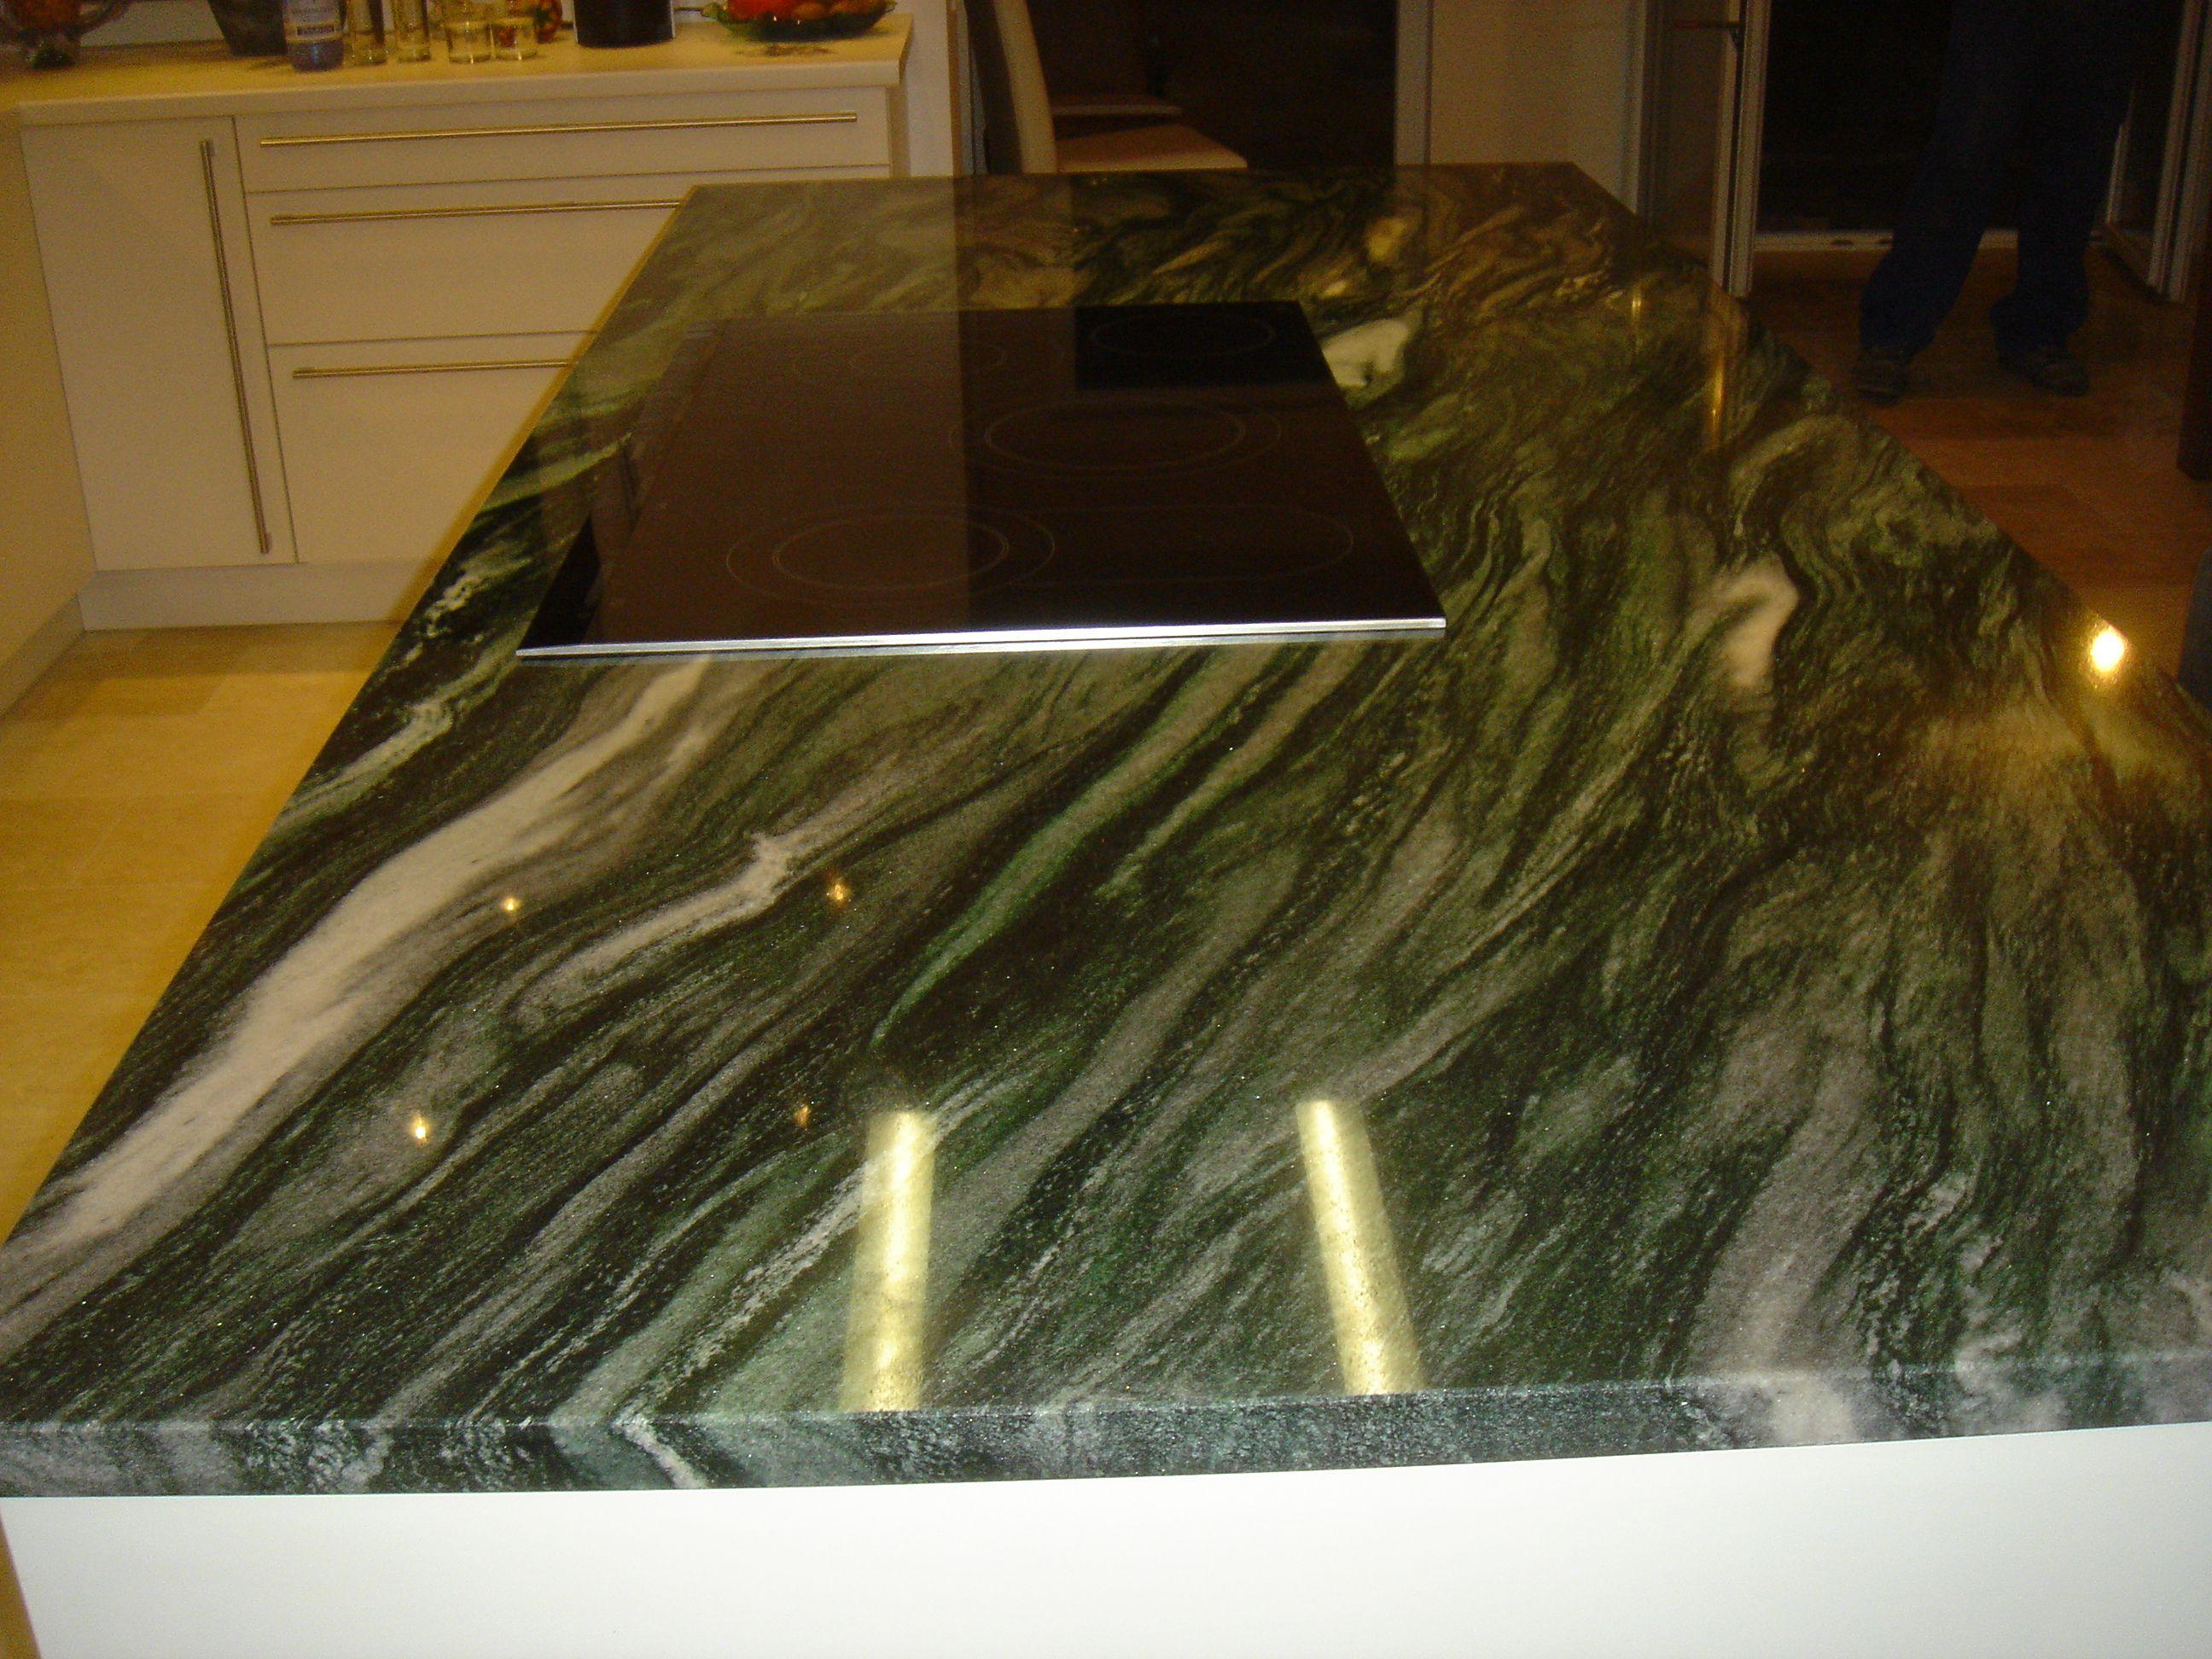 Verde Lapponia Stone Google Search Granit Arbeitsplatte Arbeitsplatte Granit